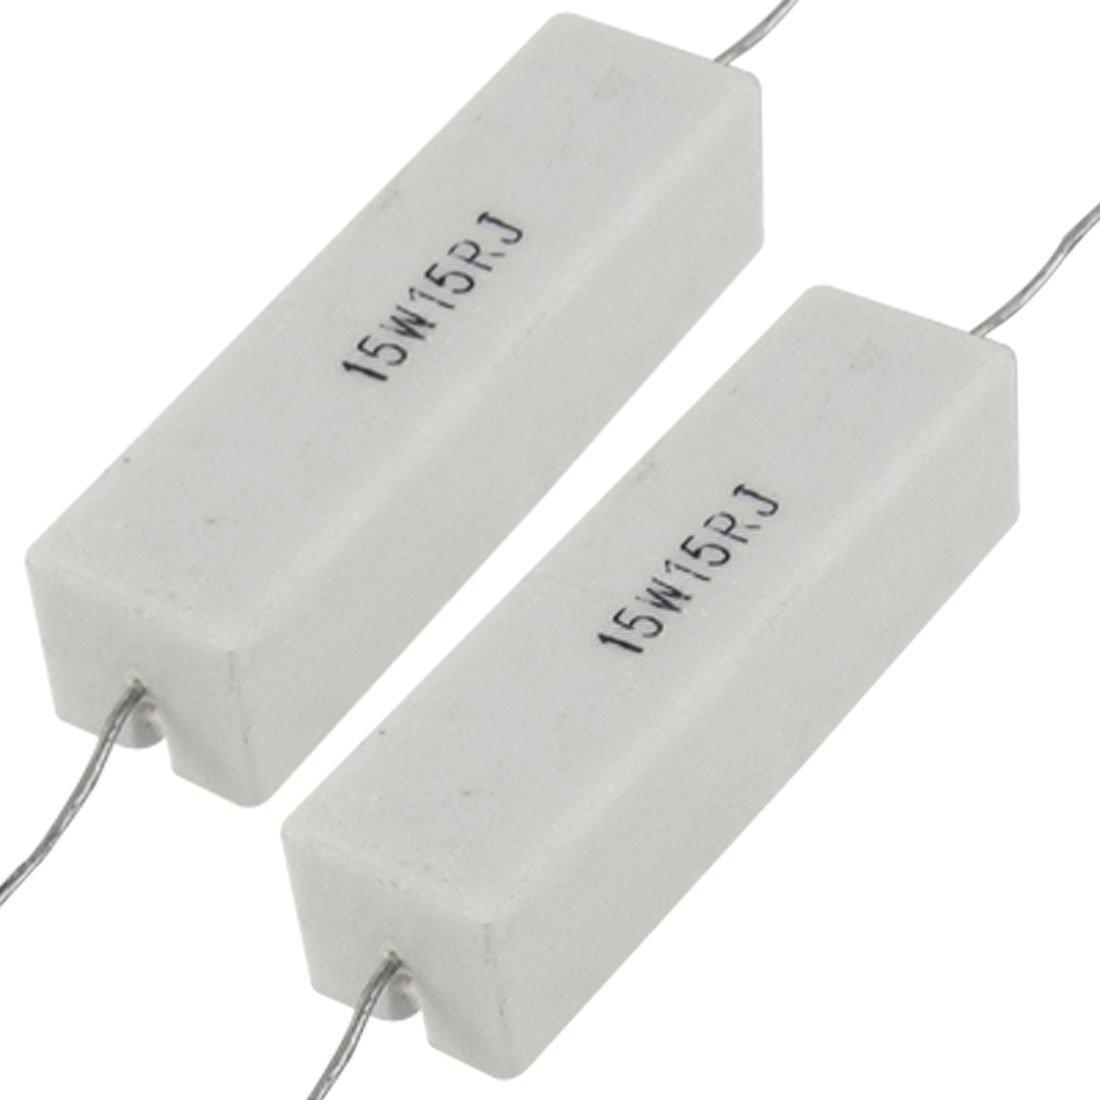 Uxcell a11111600ux0111 15 15R Ohm 5/% 15W Wirewound Ceramic Cement Resistor 2 Piece